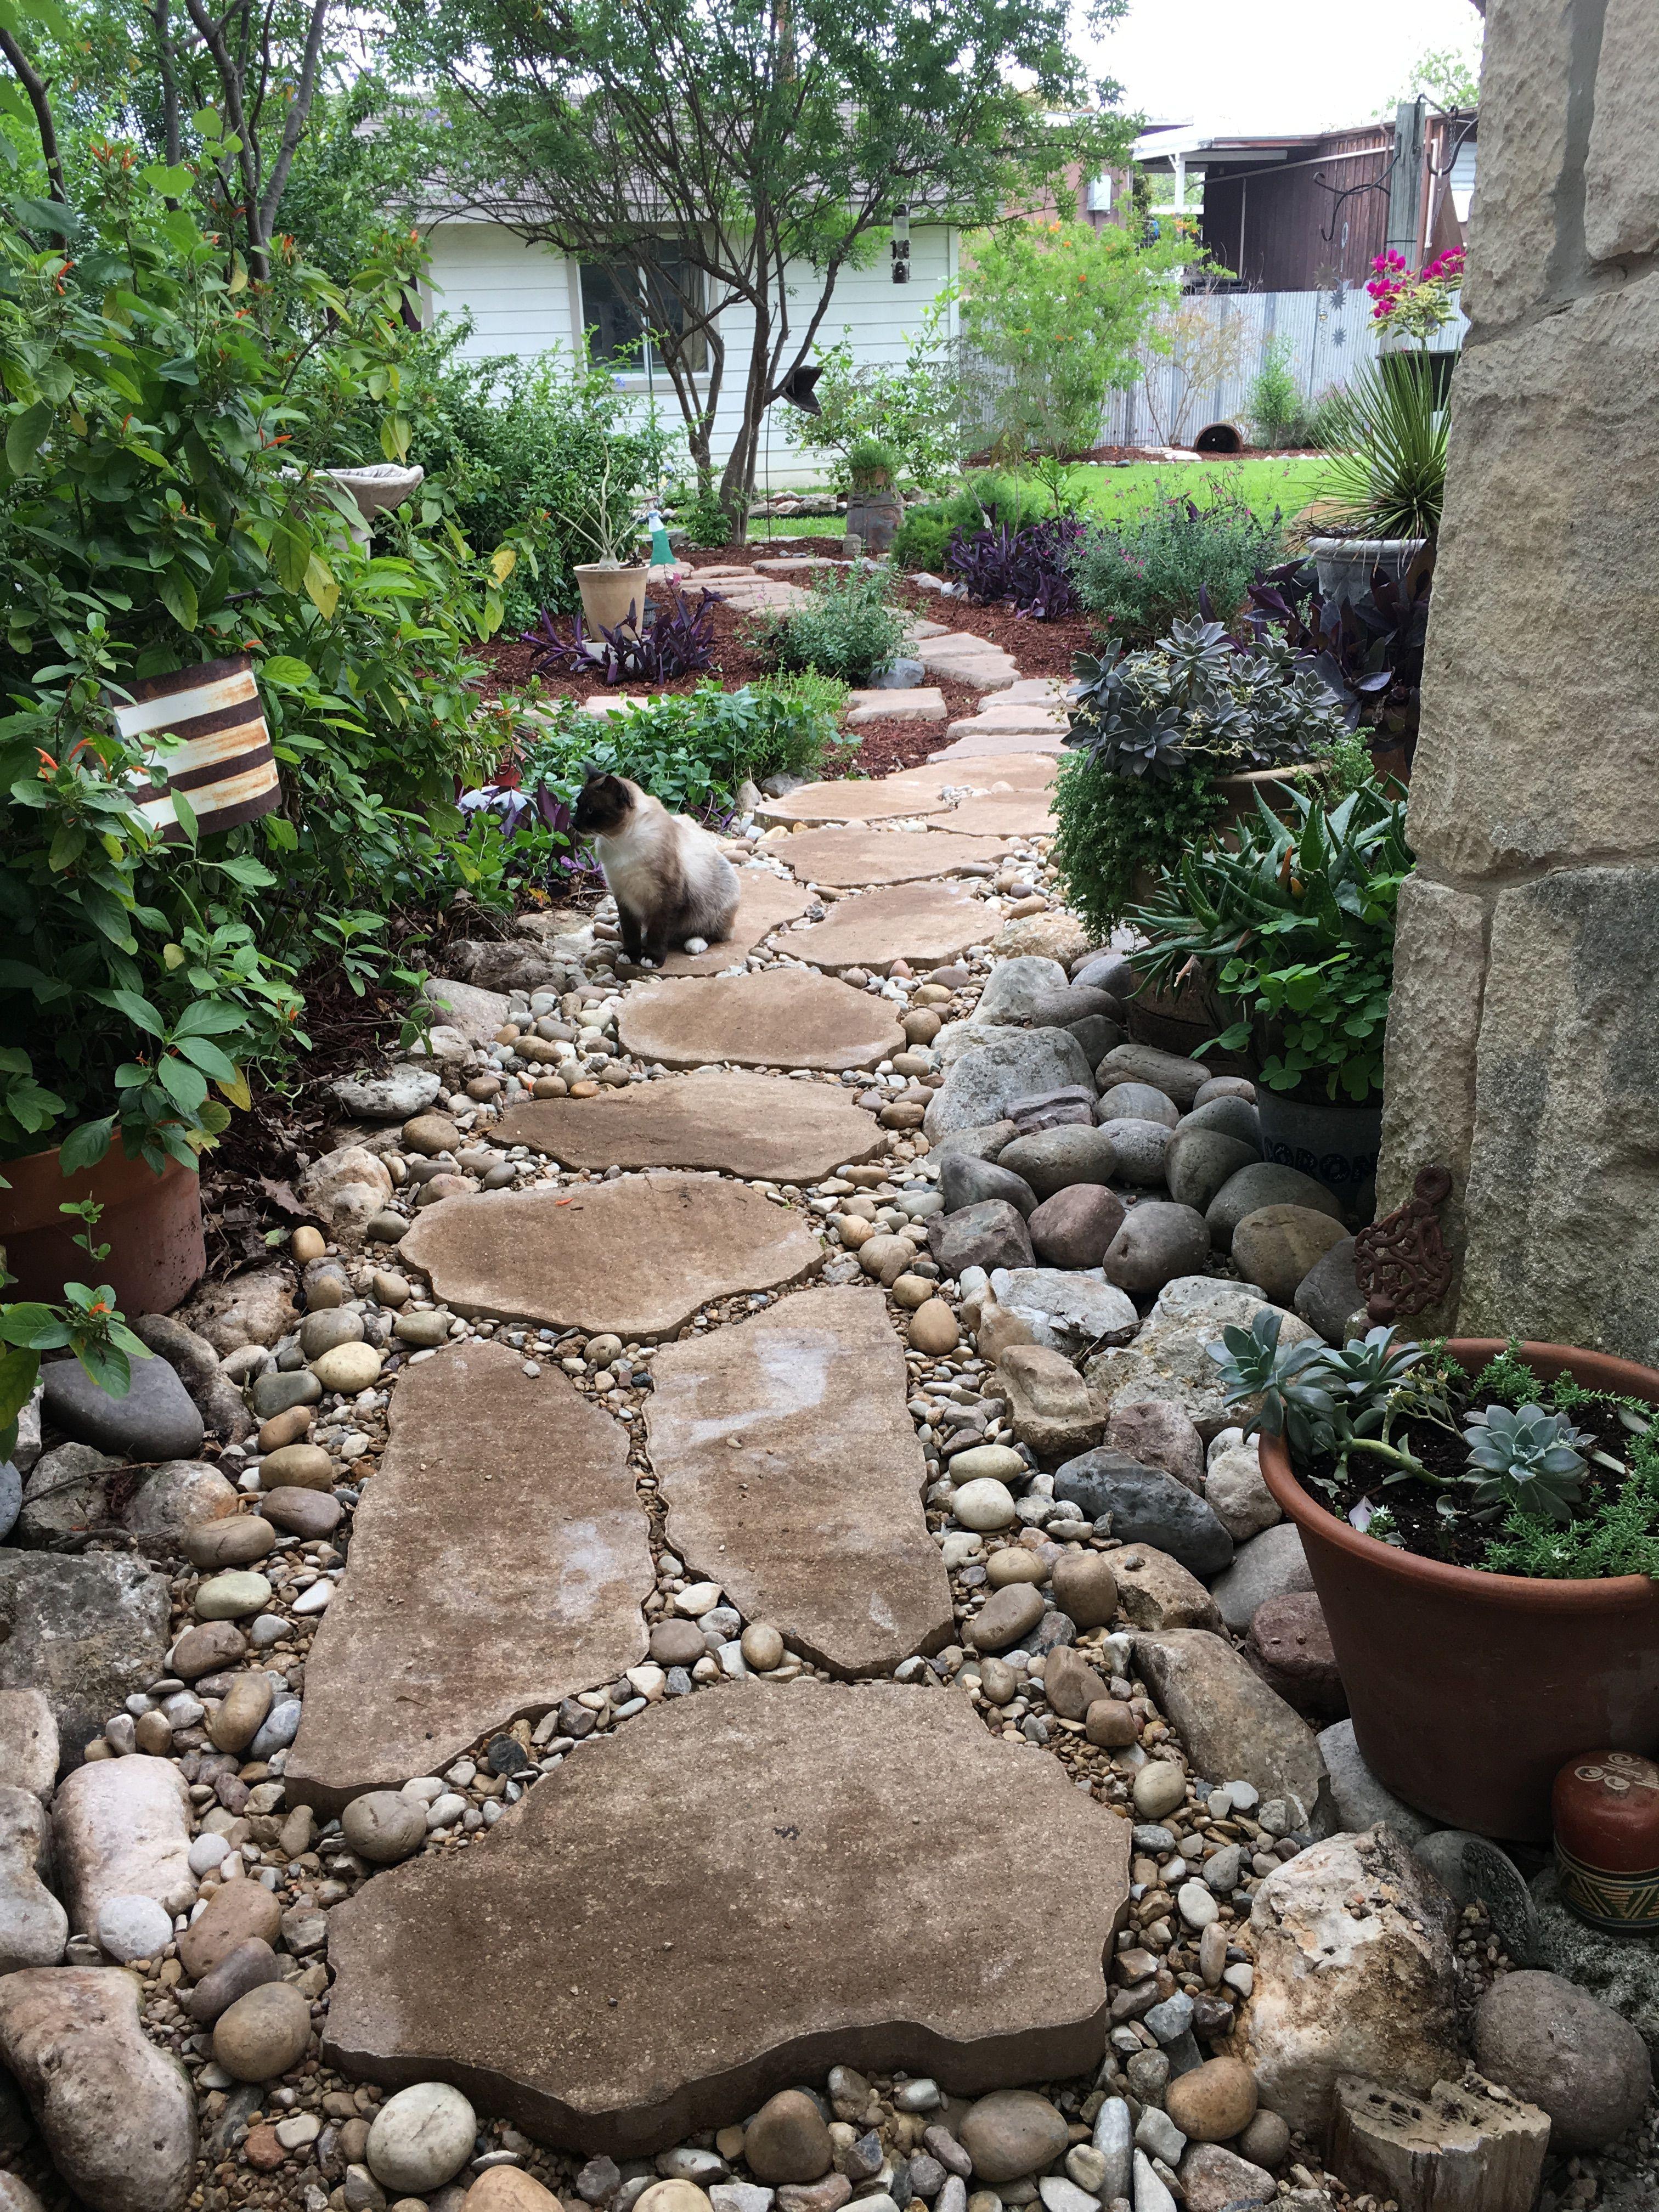 Pin By Lisa Leon On Gardening And Outdoor Rock Garden Landscaping Backyard Landscaping Designs Rock Garden Design